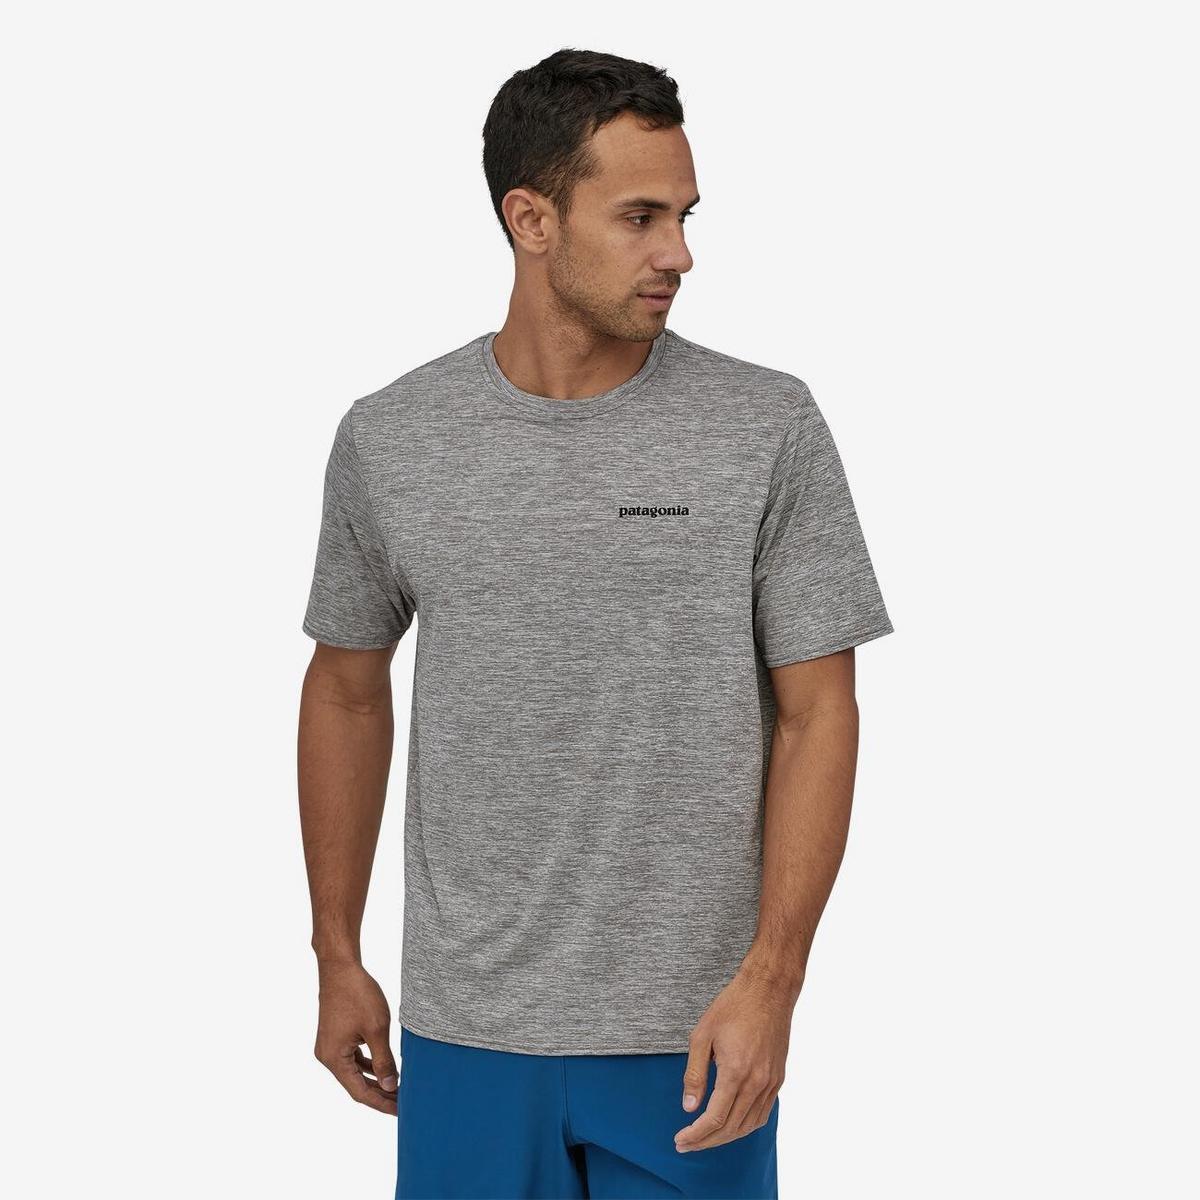 Patagonia Men's Patagonia SS Cap Cool Daily T-Shirt - Grey